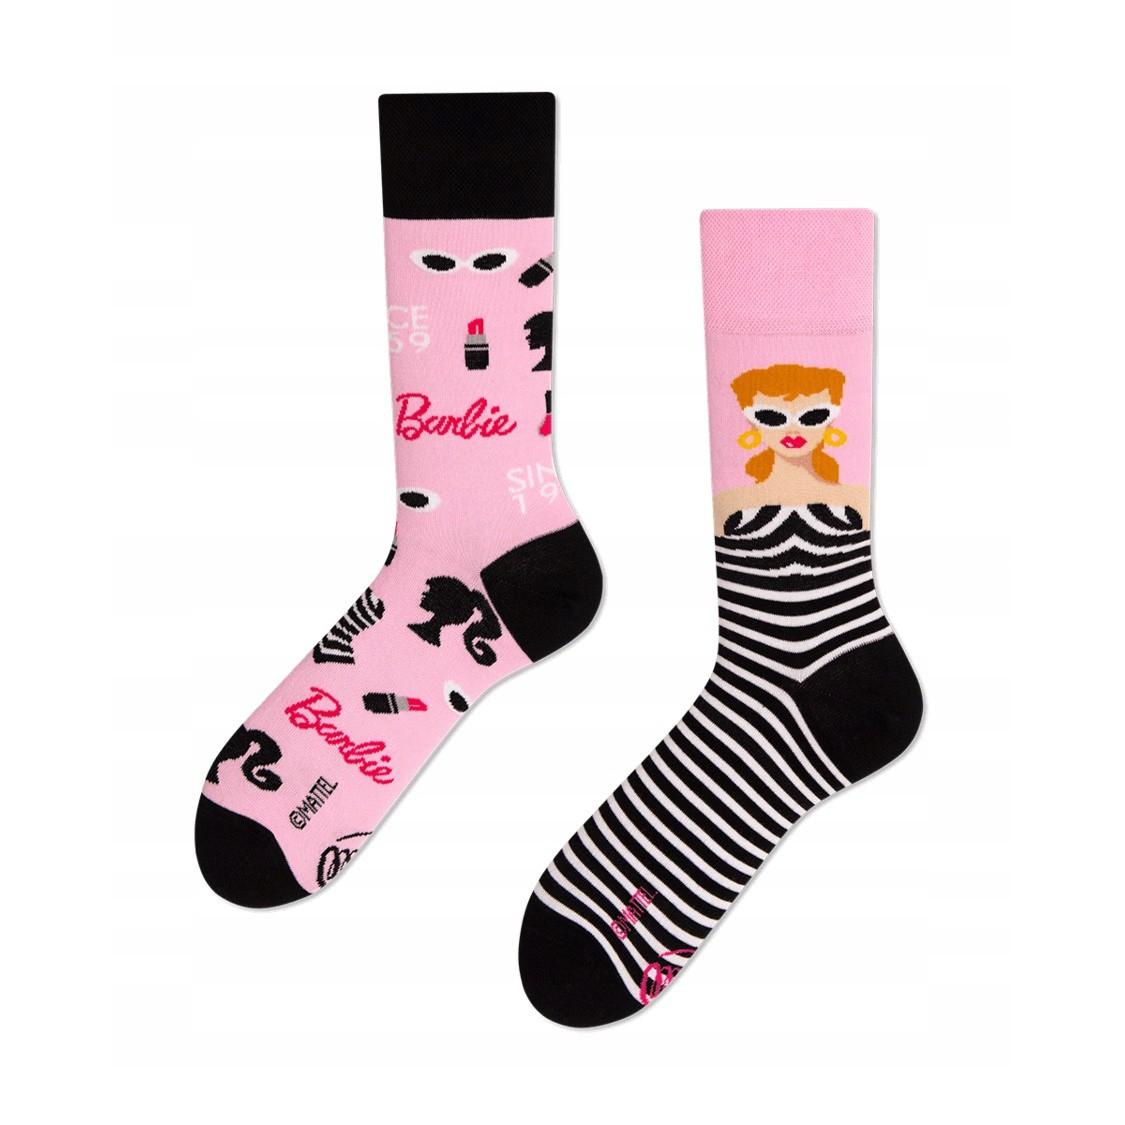 veselé ponožky BARBIE móda modelka 43-46 farebné megamix.sk